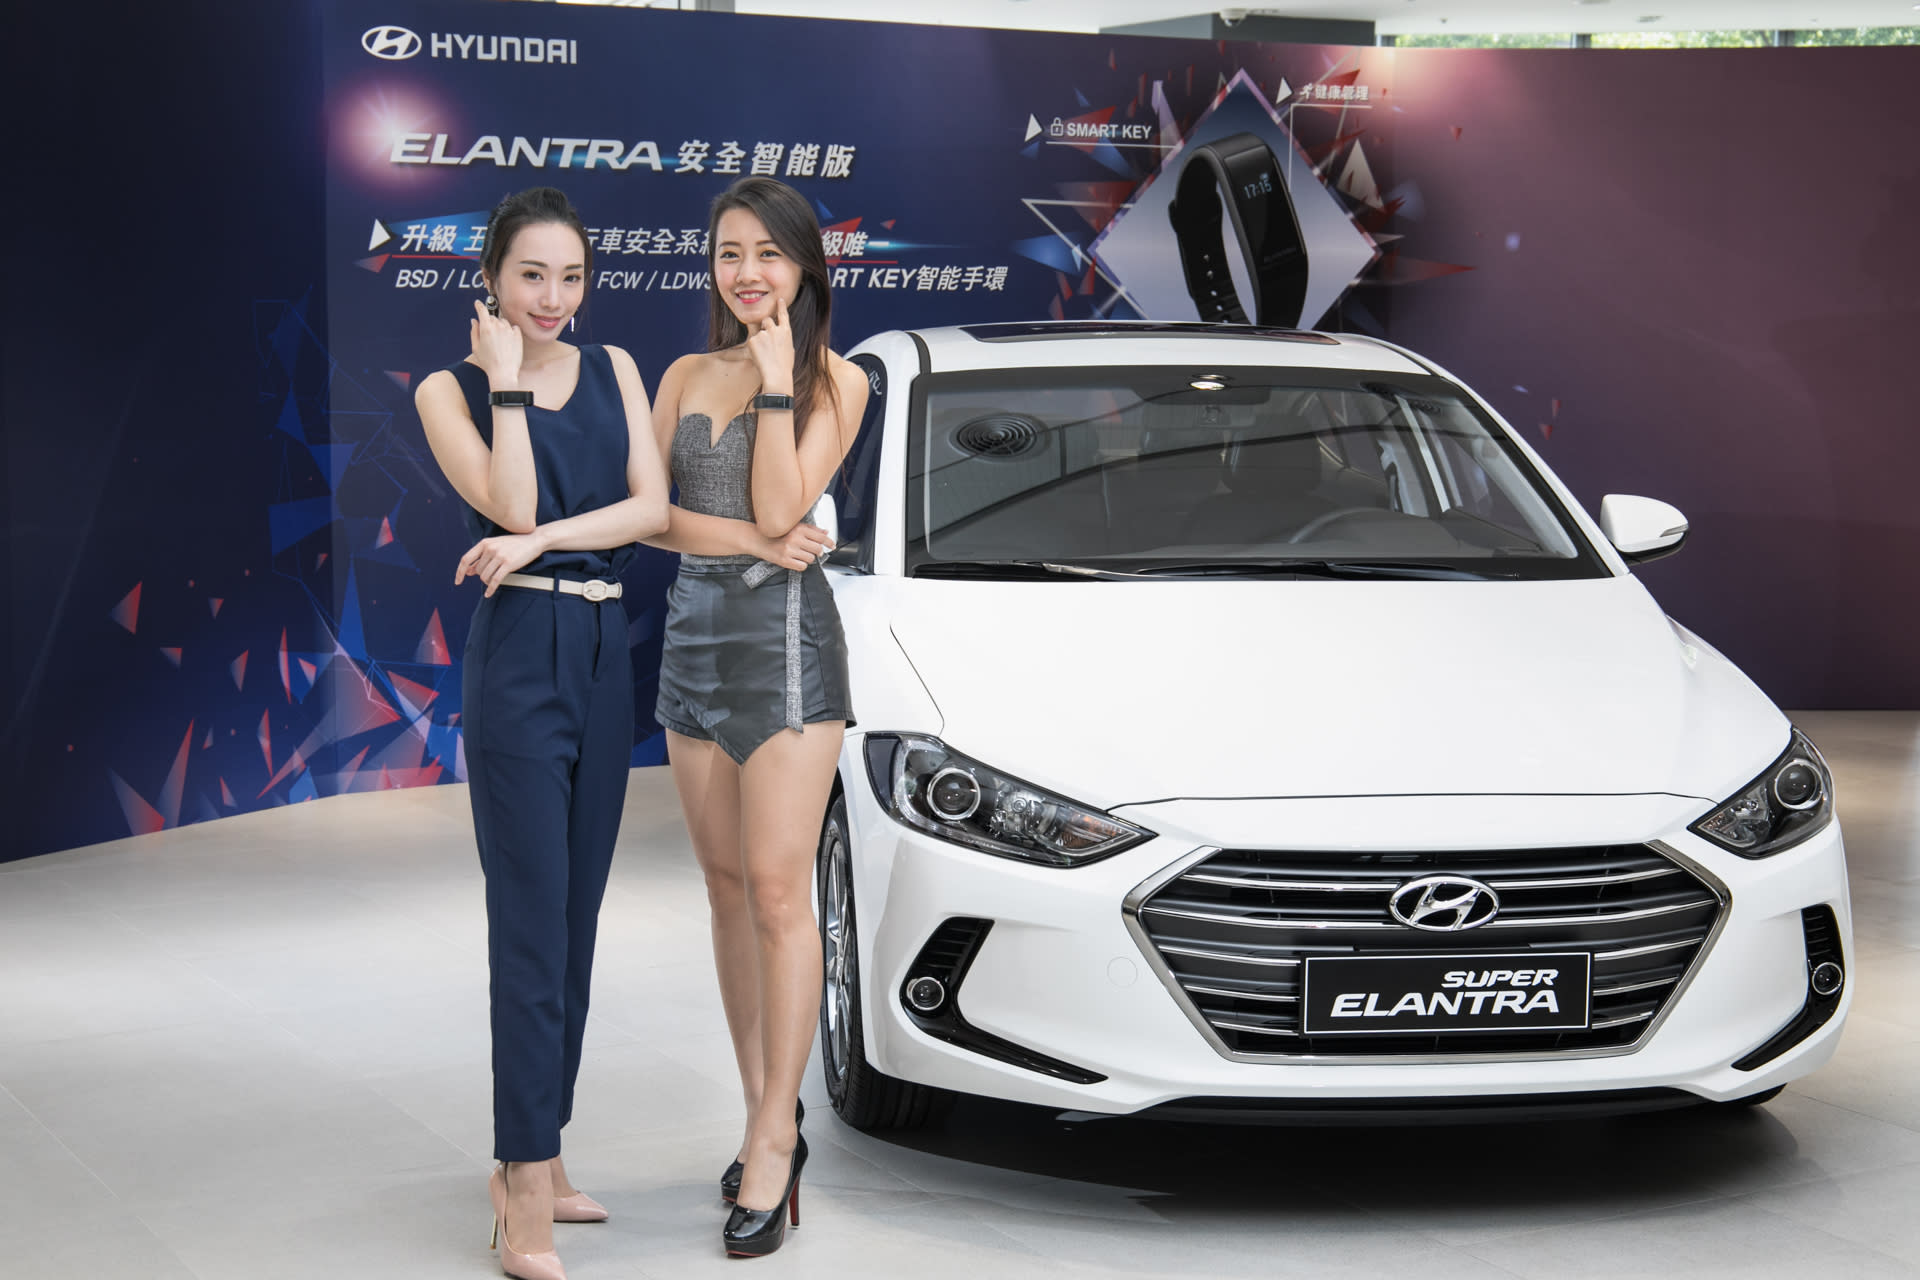 Hyundai Super Elantra 安全智能版全新上市